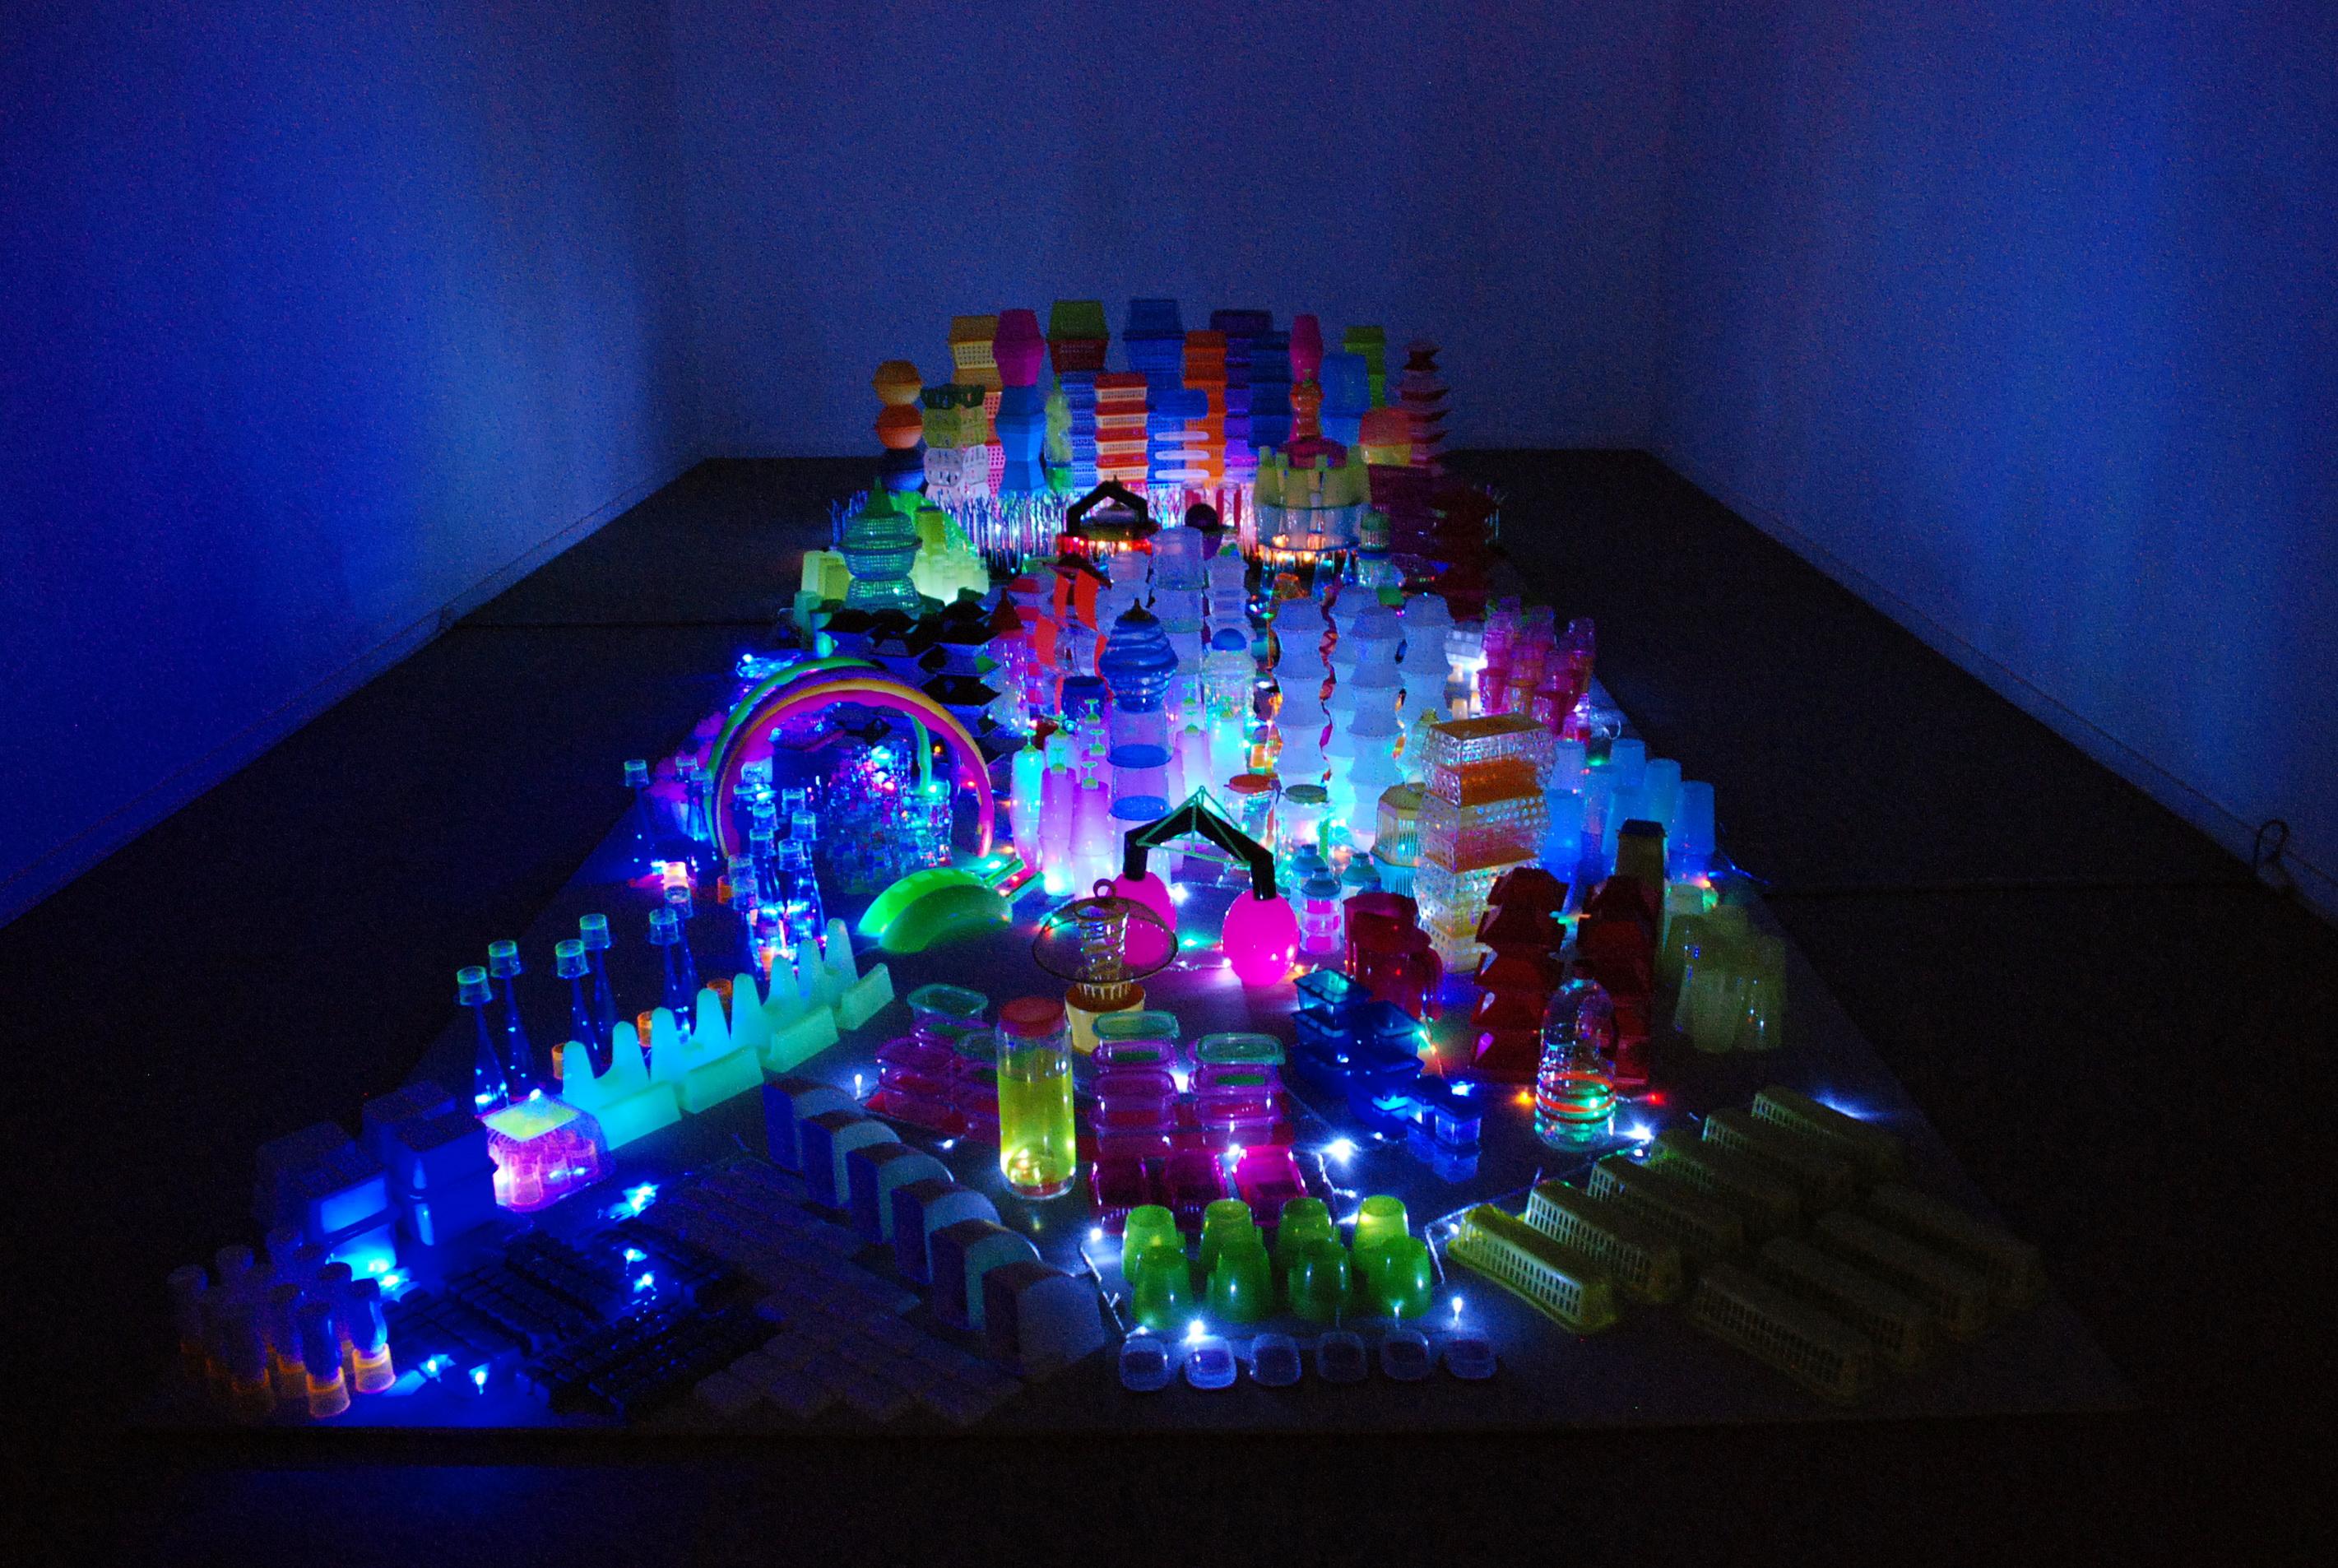 El Espacio de Arte Experimental de la Universidad de Salamanca acoge la obra 'Kapytal', de Laura Ramis